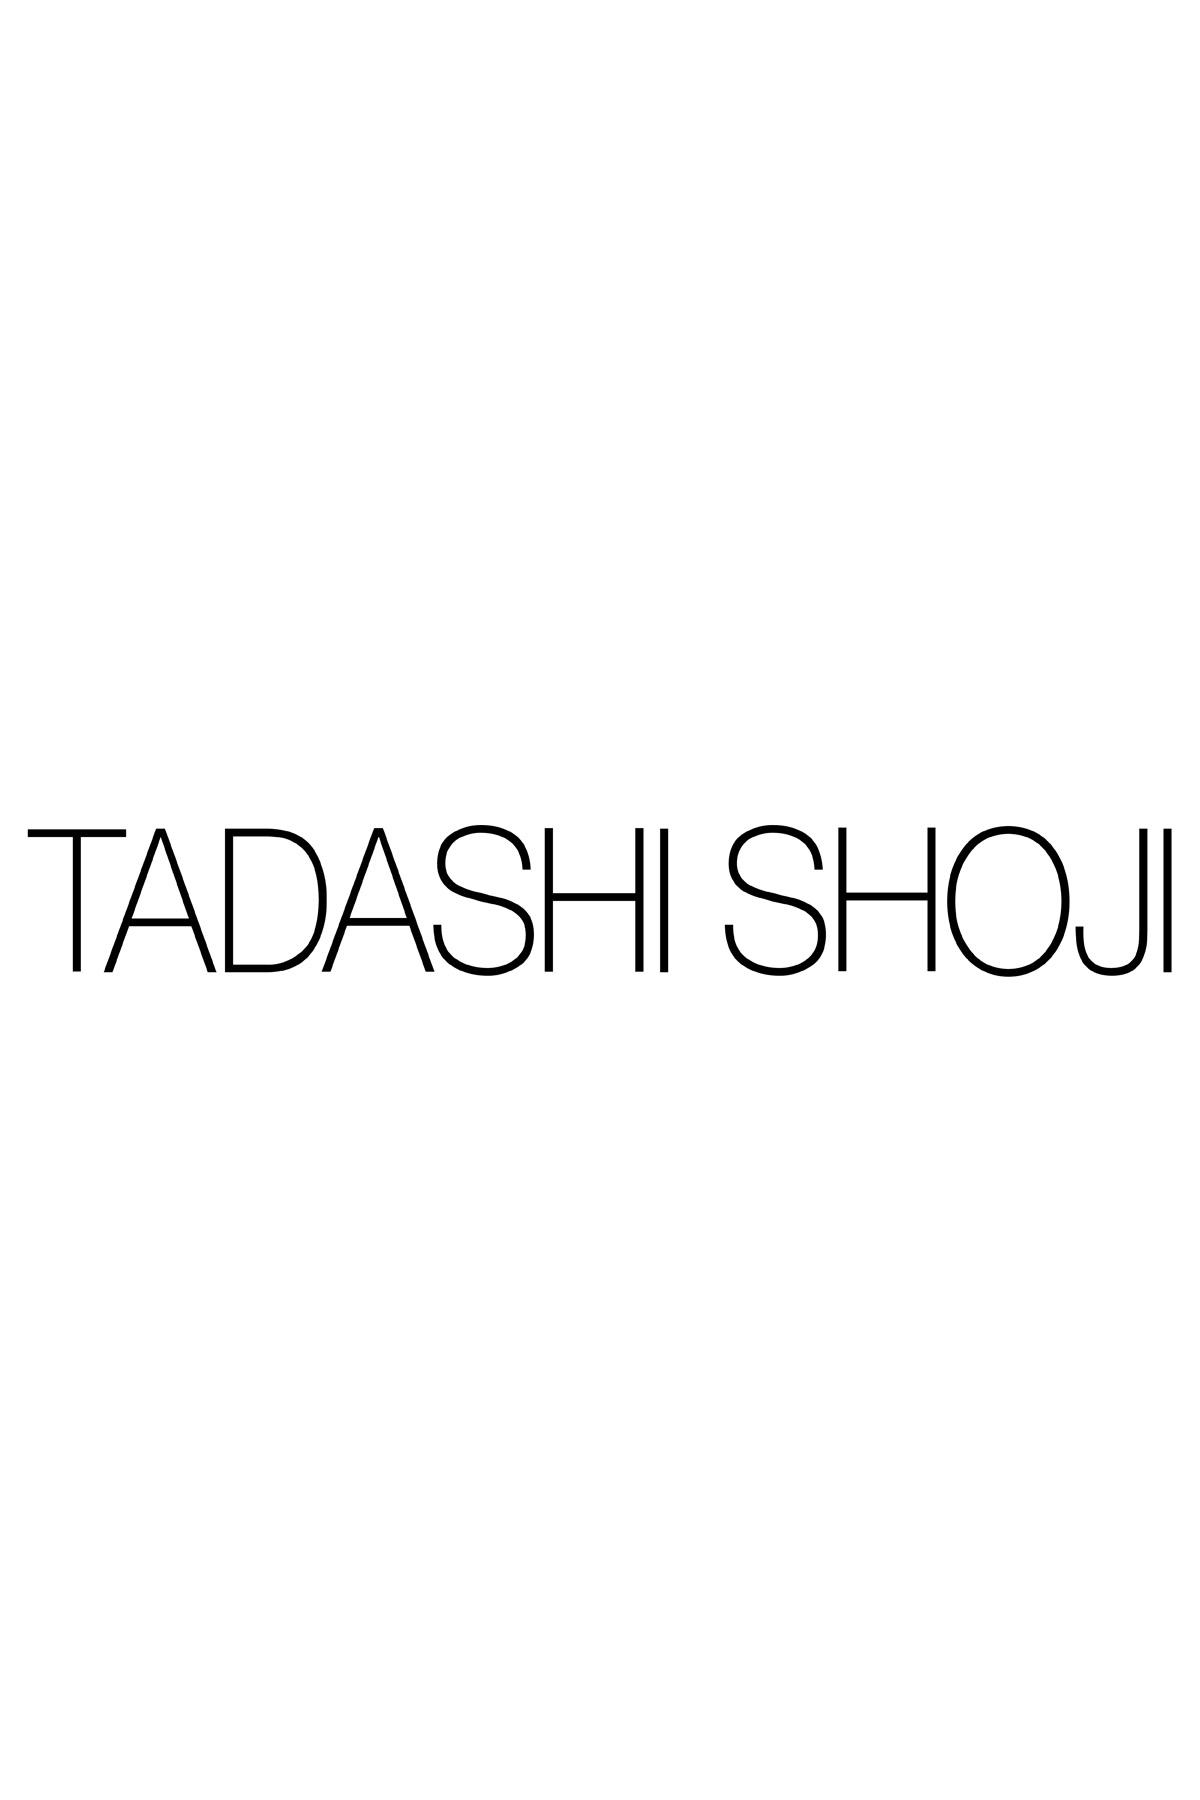 Tadashi Shoji Petite Size - Blouson Waist Paillette Embroidered Lace Cap Sleeve Dress - Detail